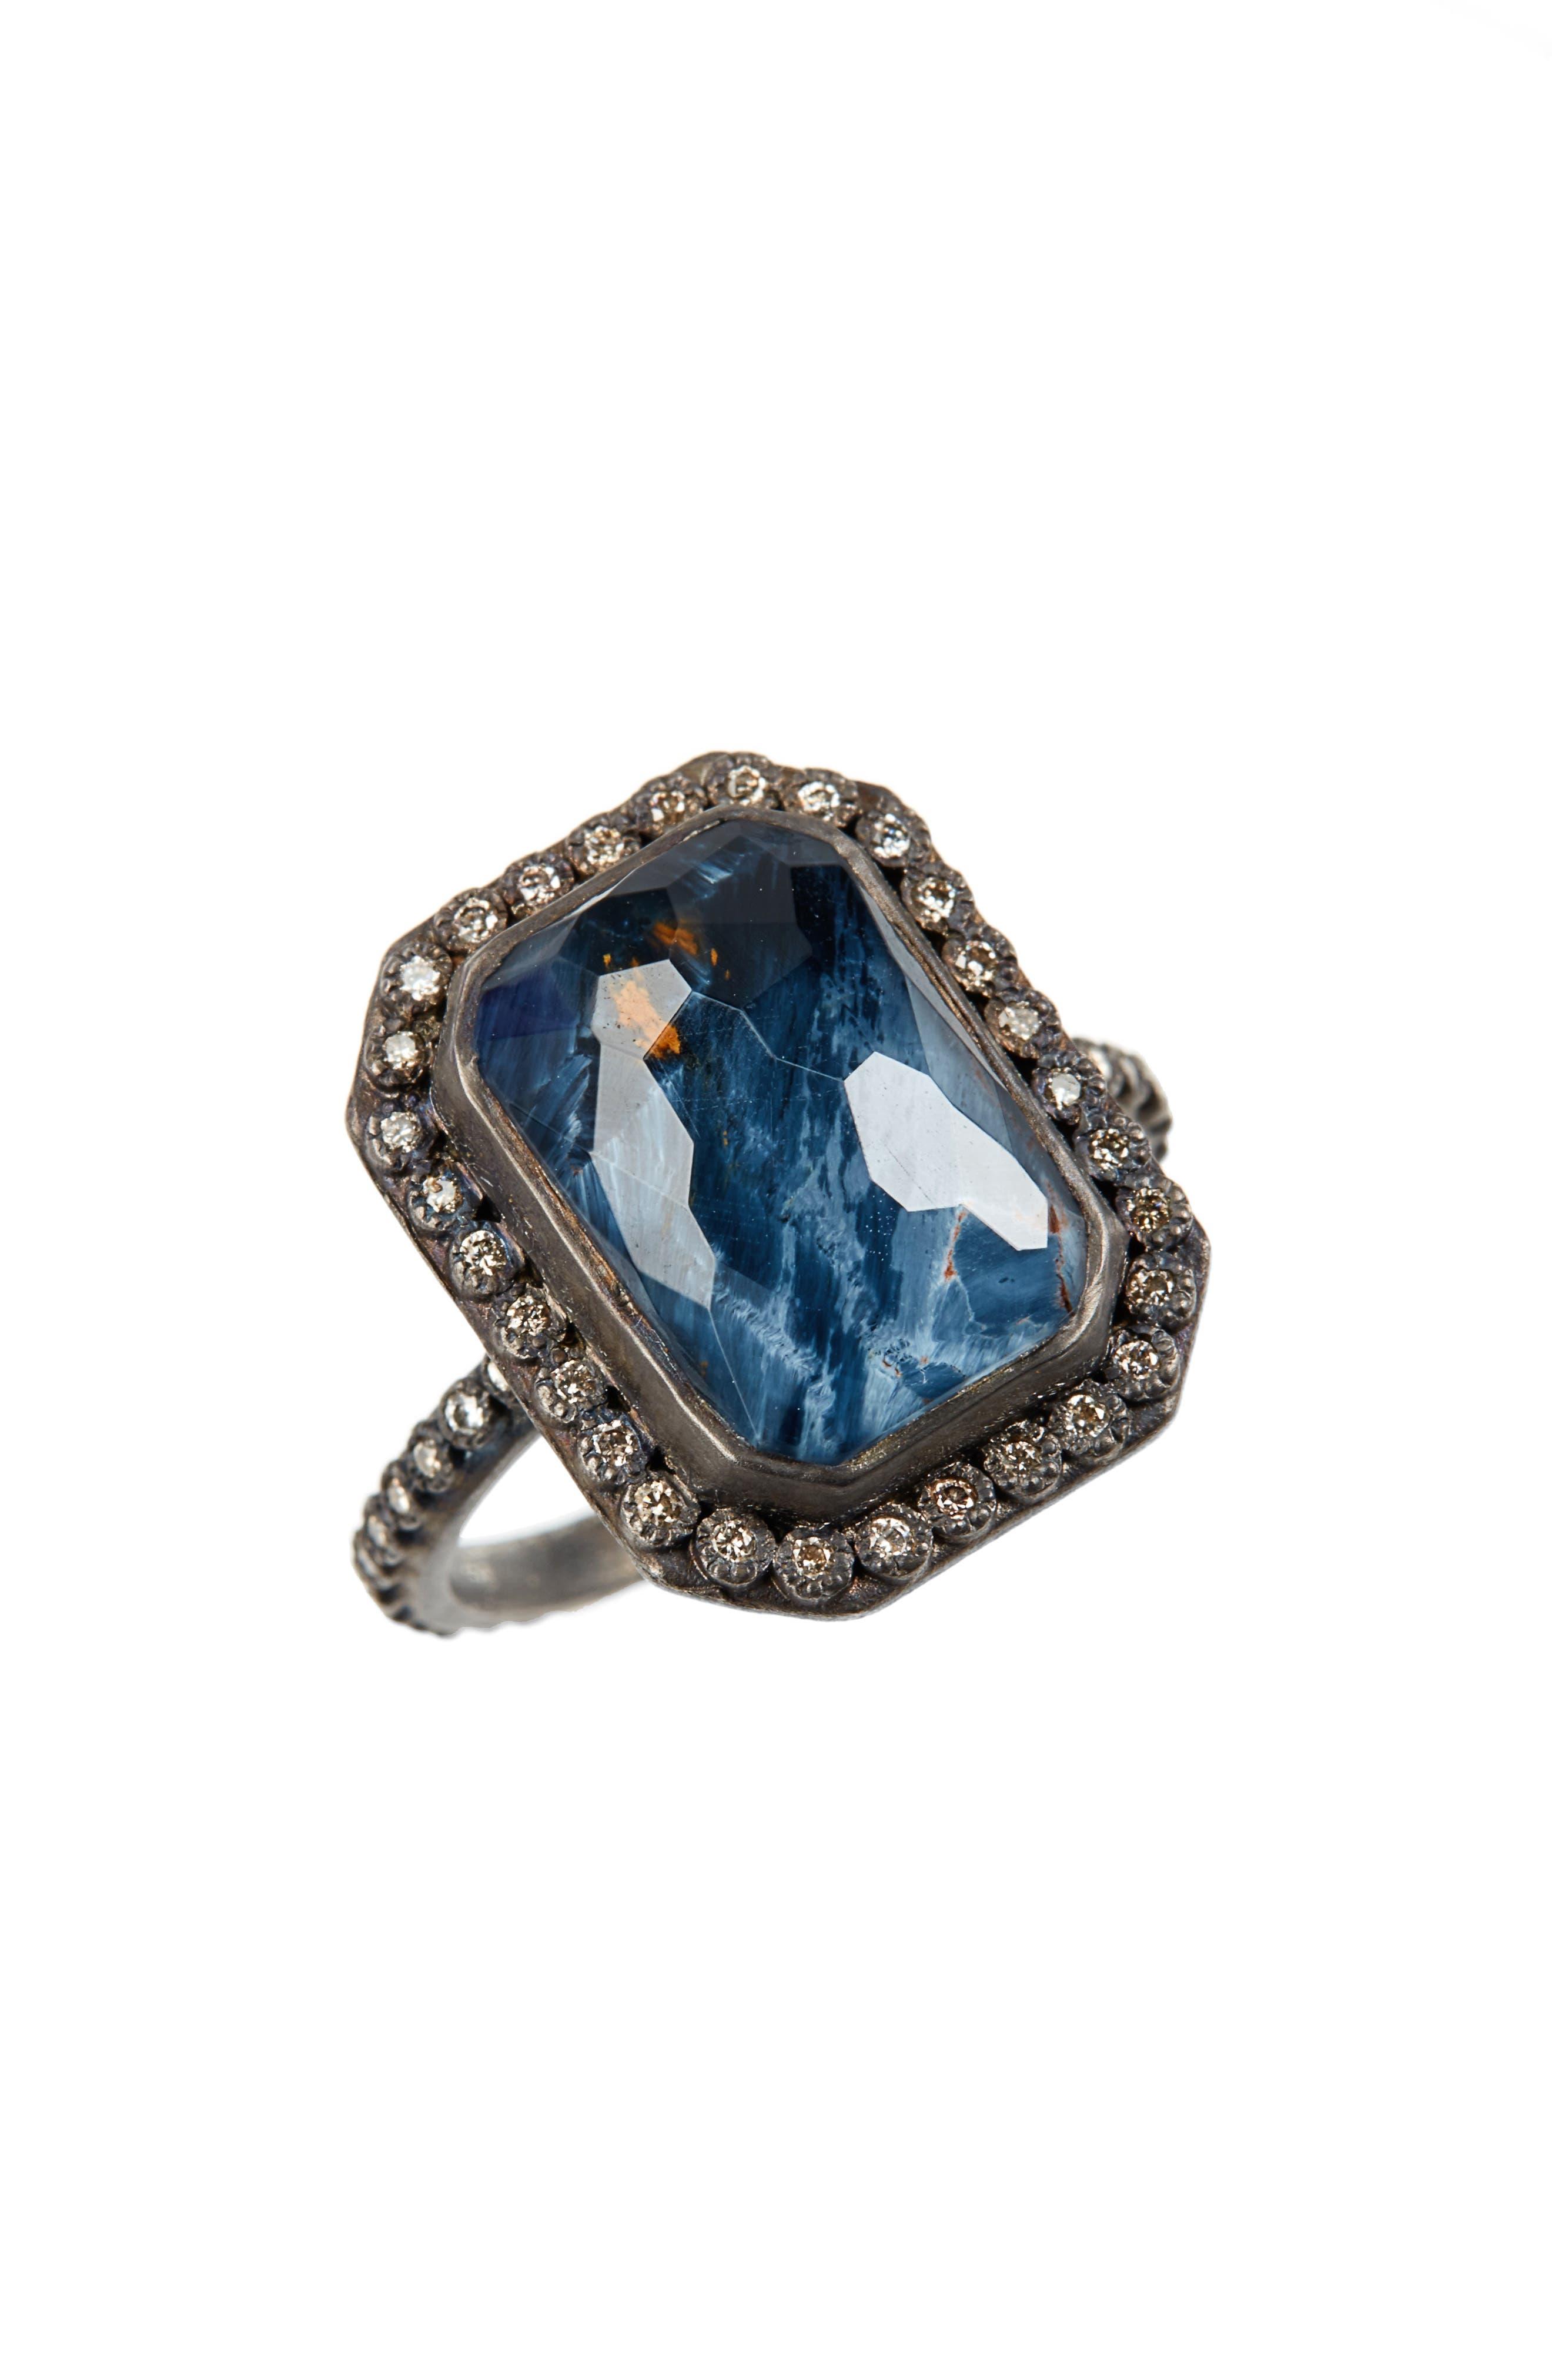 Old World Midnight Emerald-Cut Quartz & Diamond Ring,                             Main thumbnail 1, color,                             SILVER